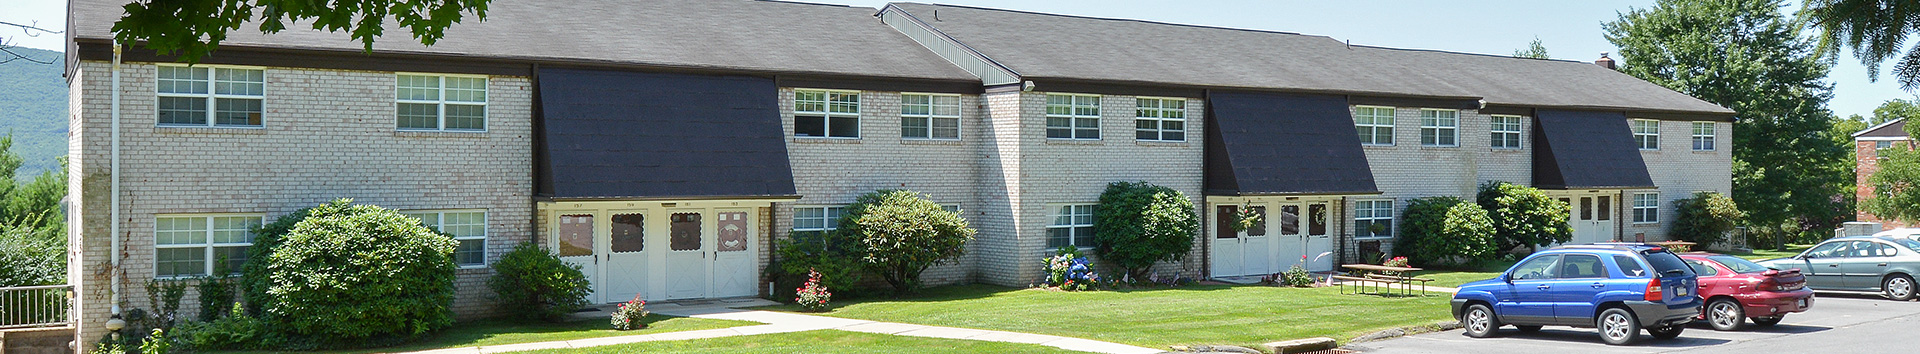 Exterior Side view of Grampian Hills Apartments at Manor Communities, Williamsport/Pennsylvania